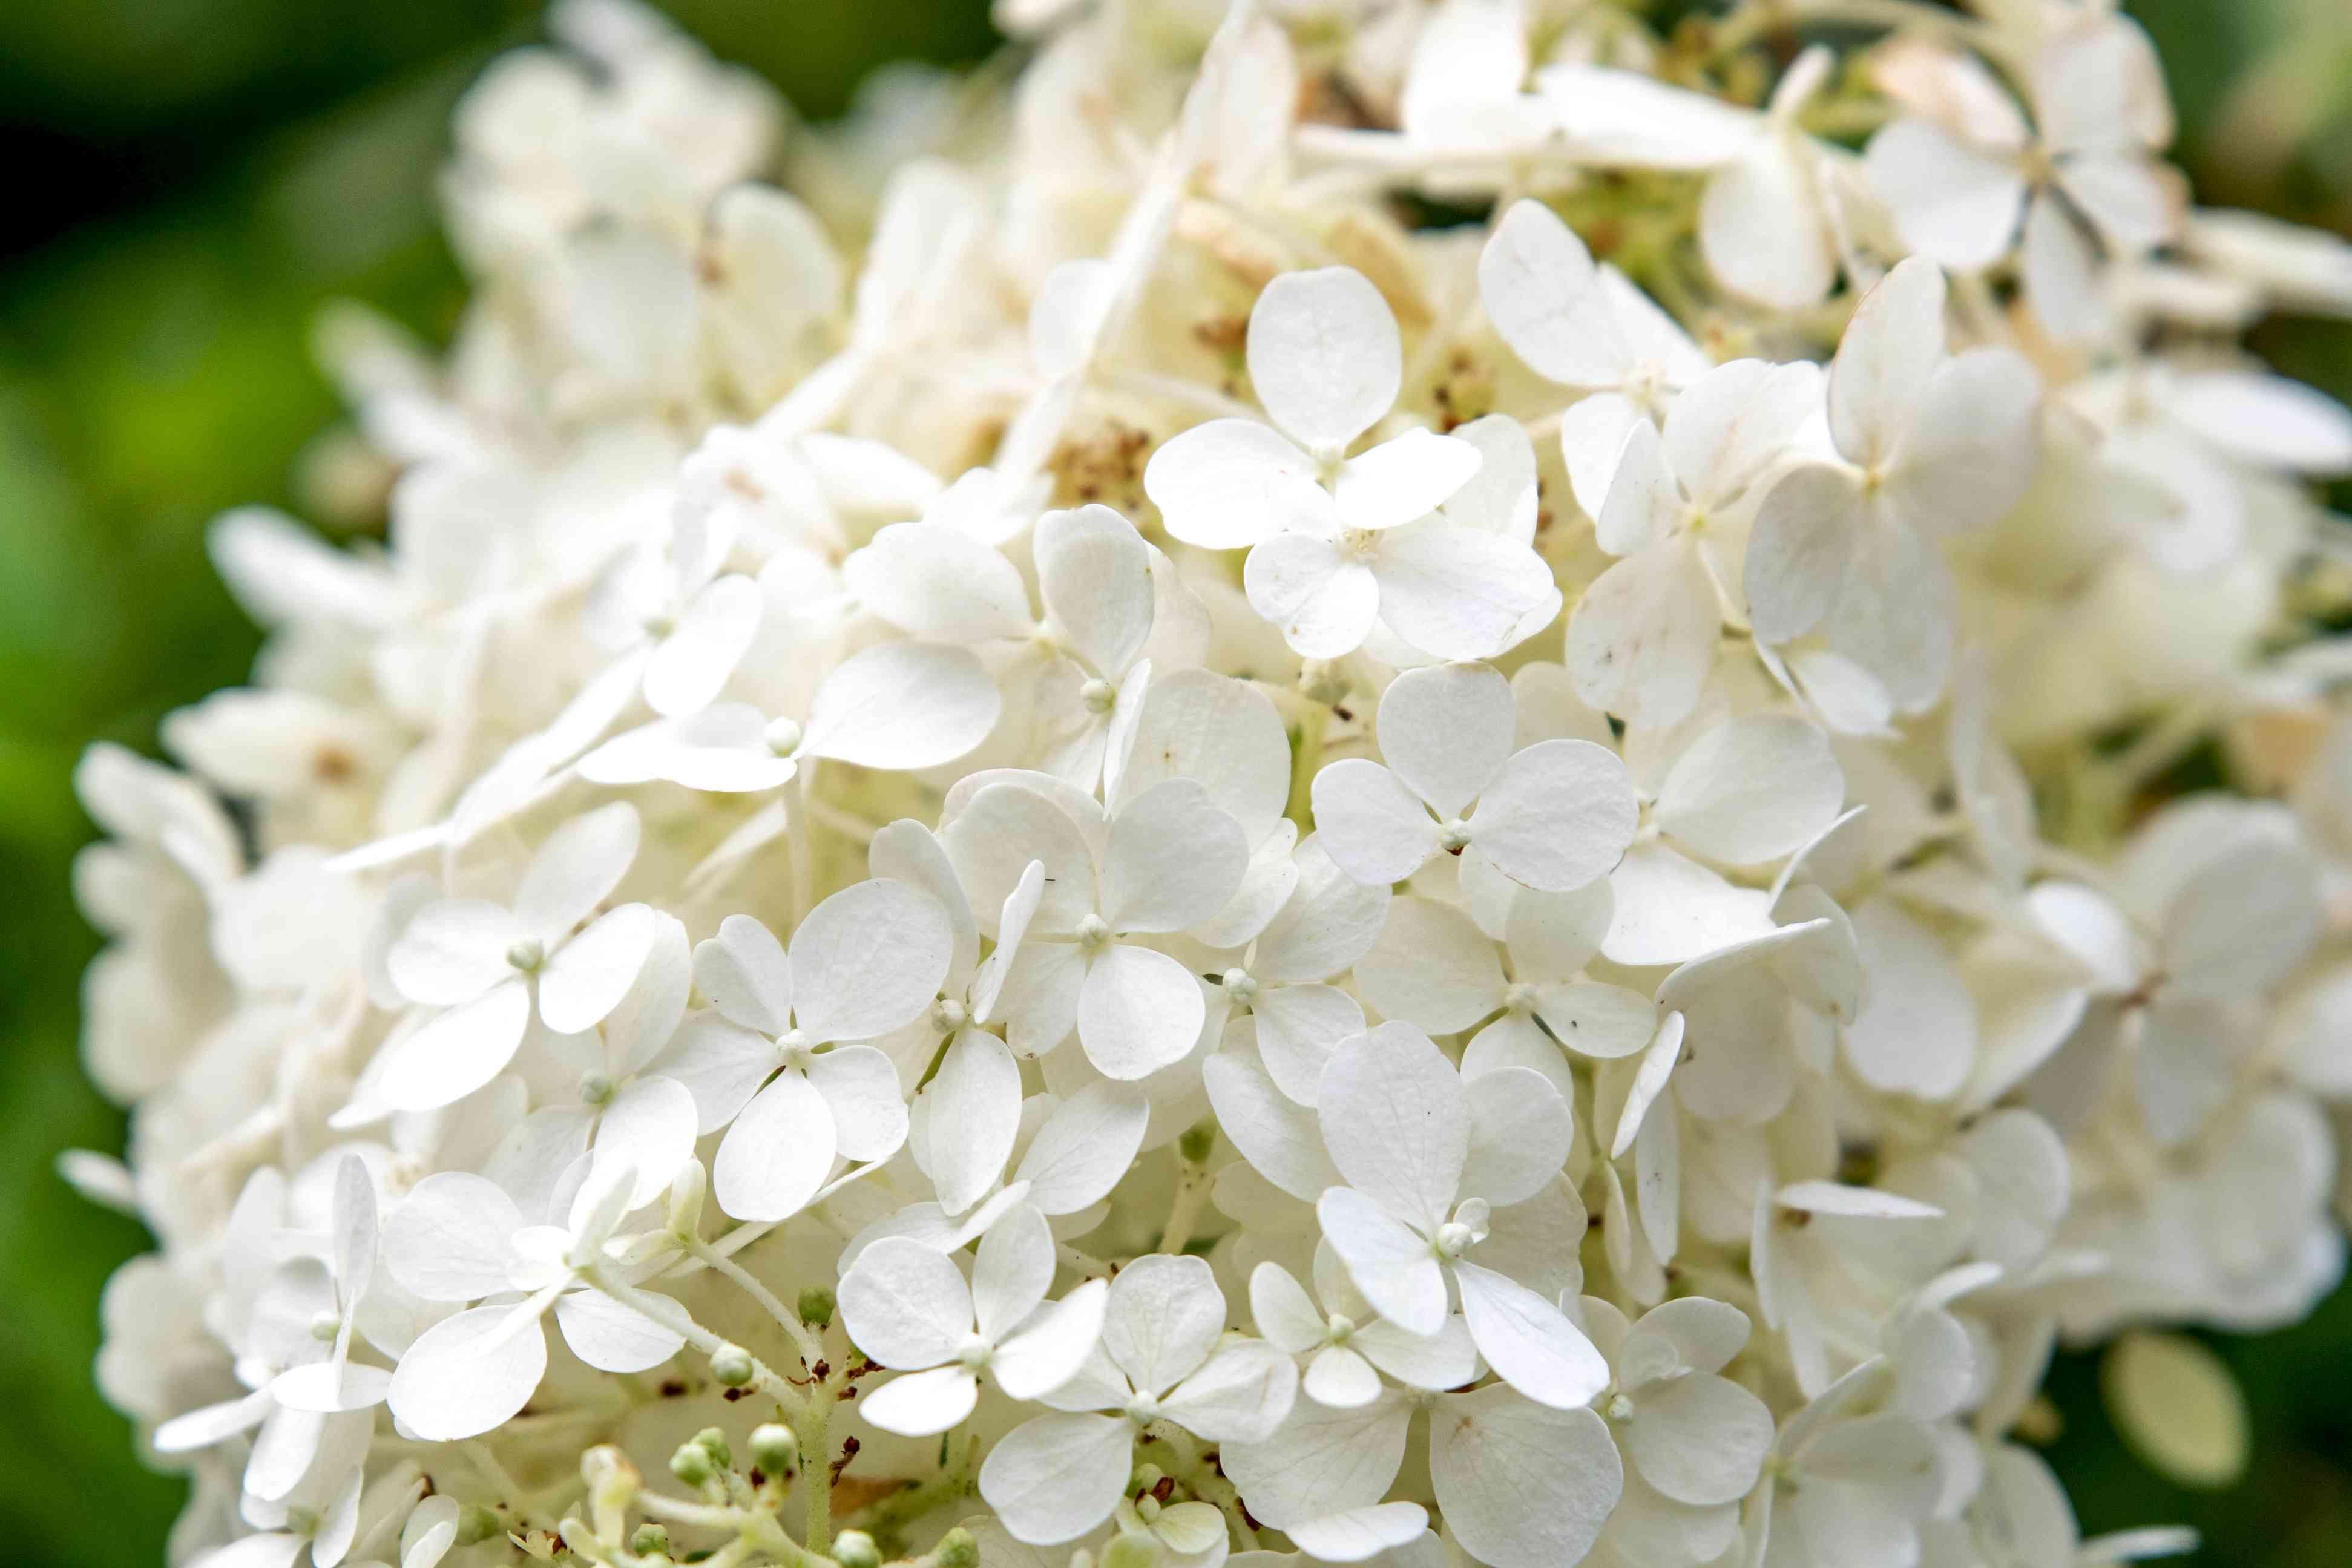 Bobo hydrangea shrub white flower panicles closeup